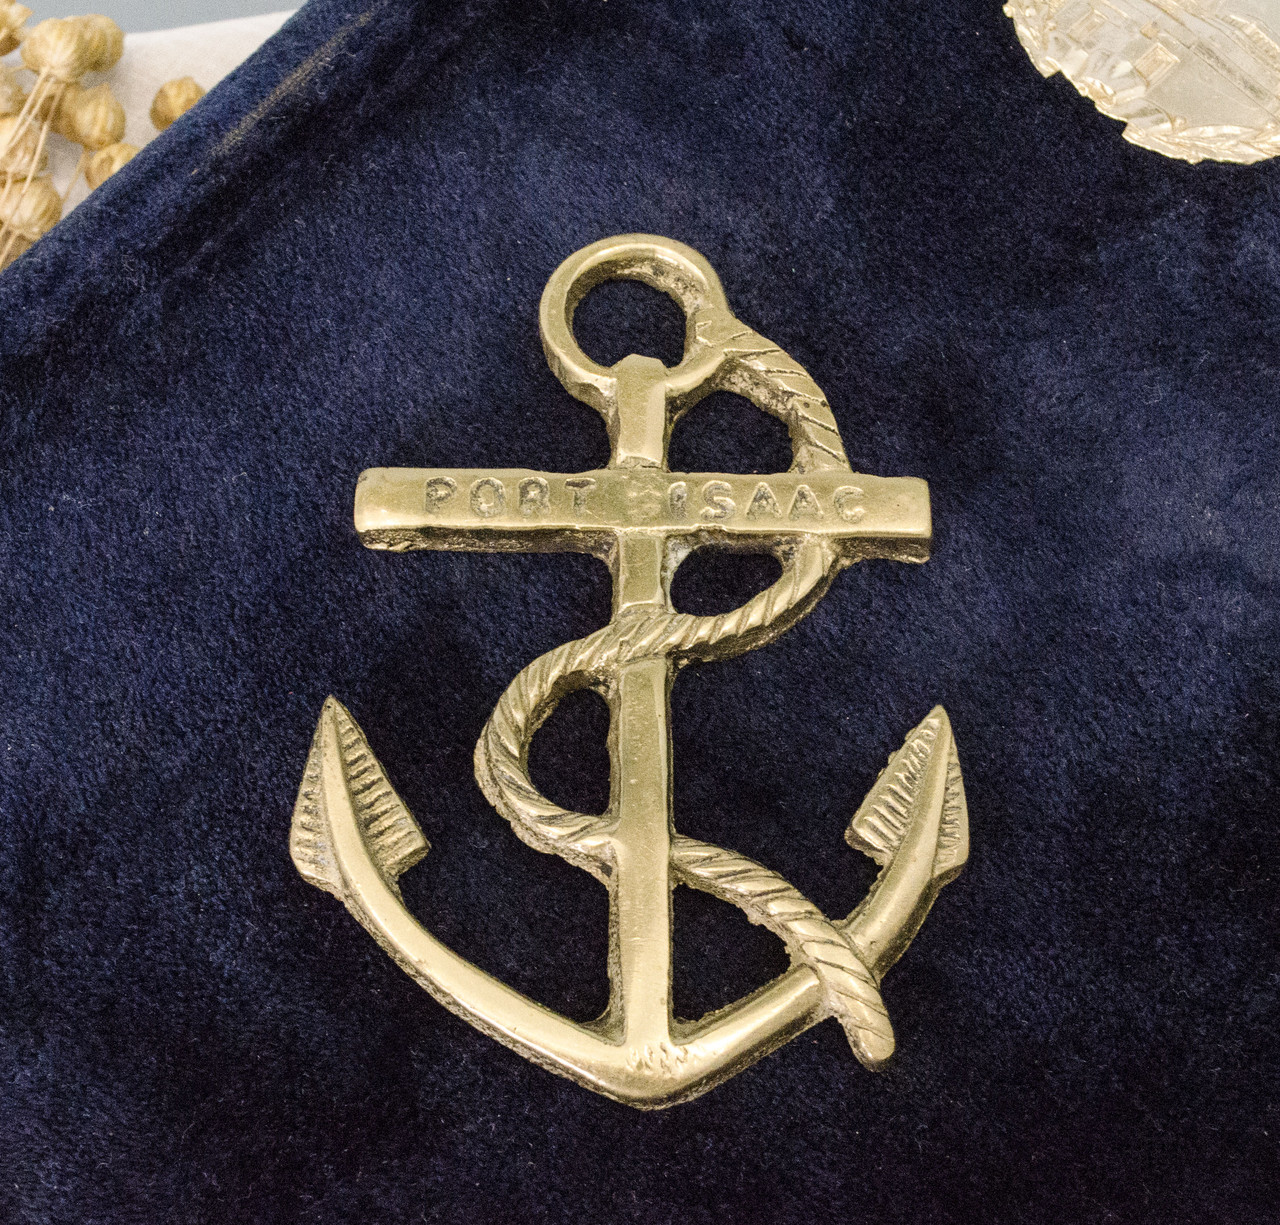 Латунная накладка нашивка, морская тематика, винтаж, латунь, Англия, якорь